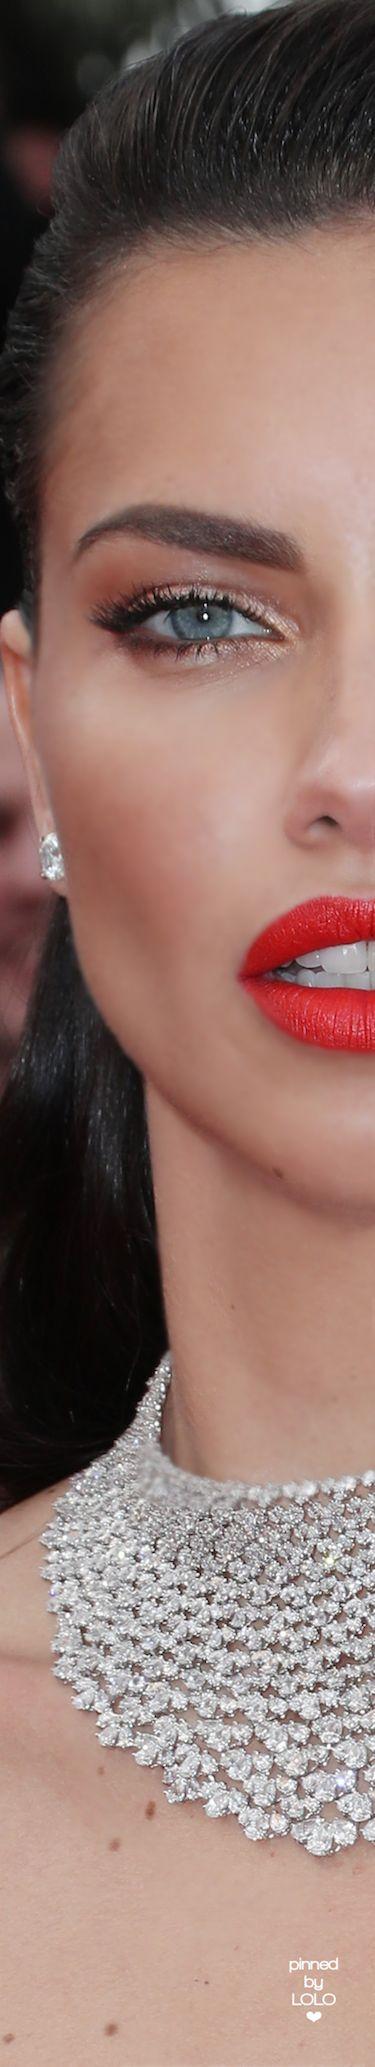 Adriana Lima Cannes Film Festival 2017